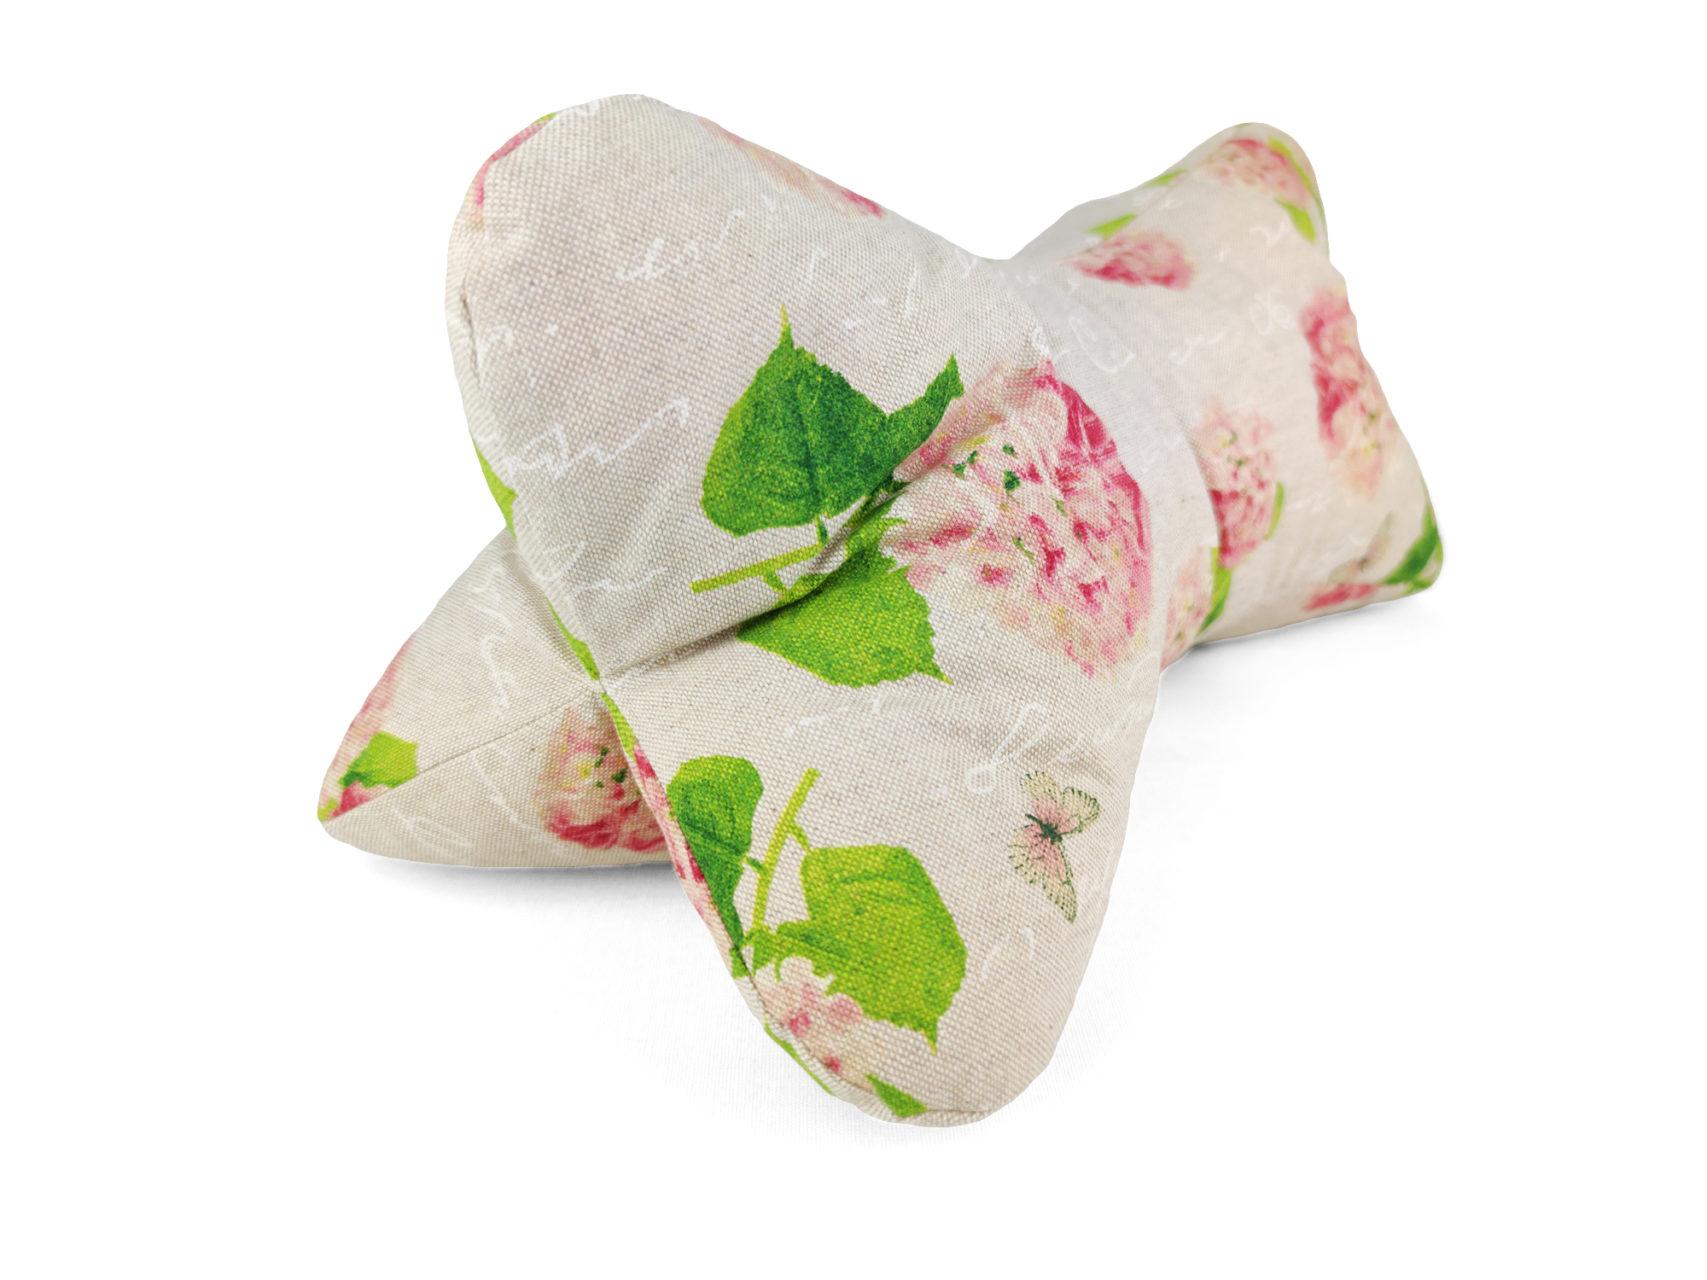 Leseknochen Leinen Look rosa Hortensien Blüten